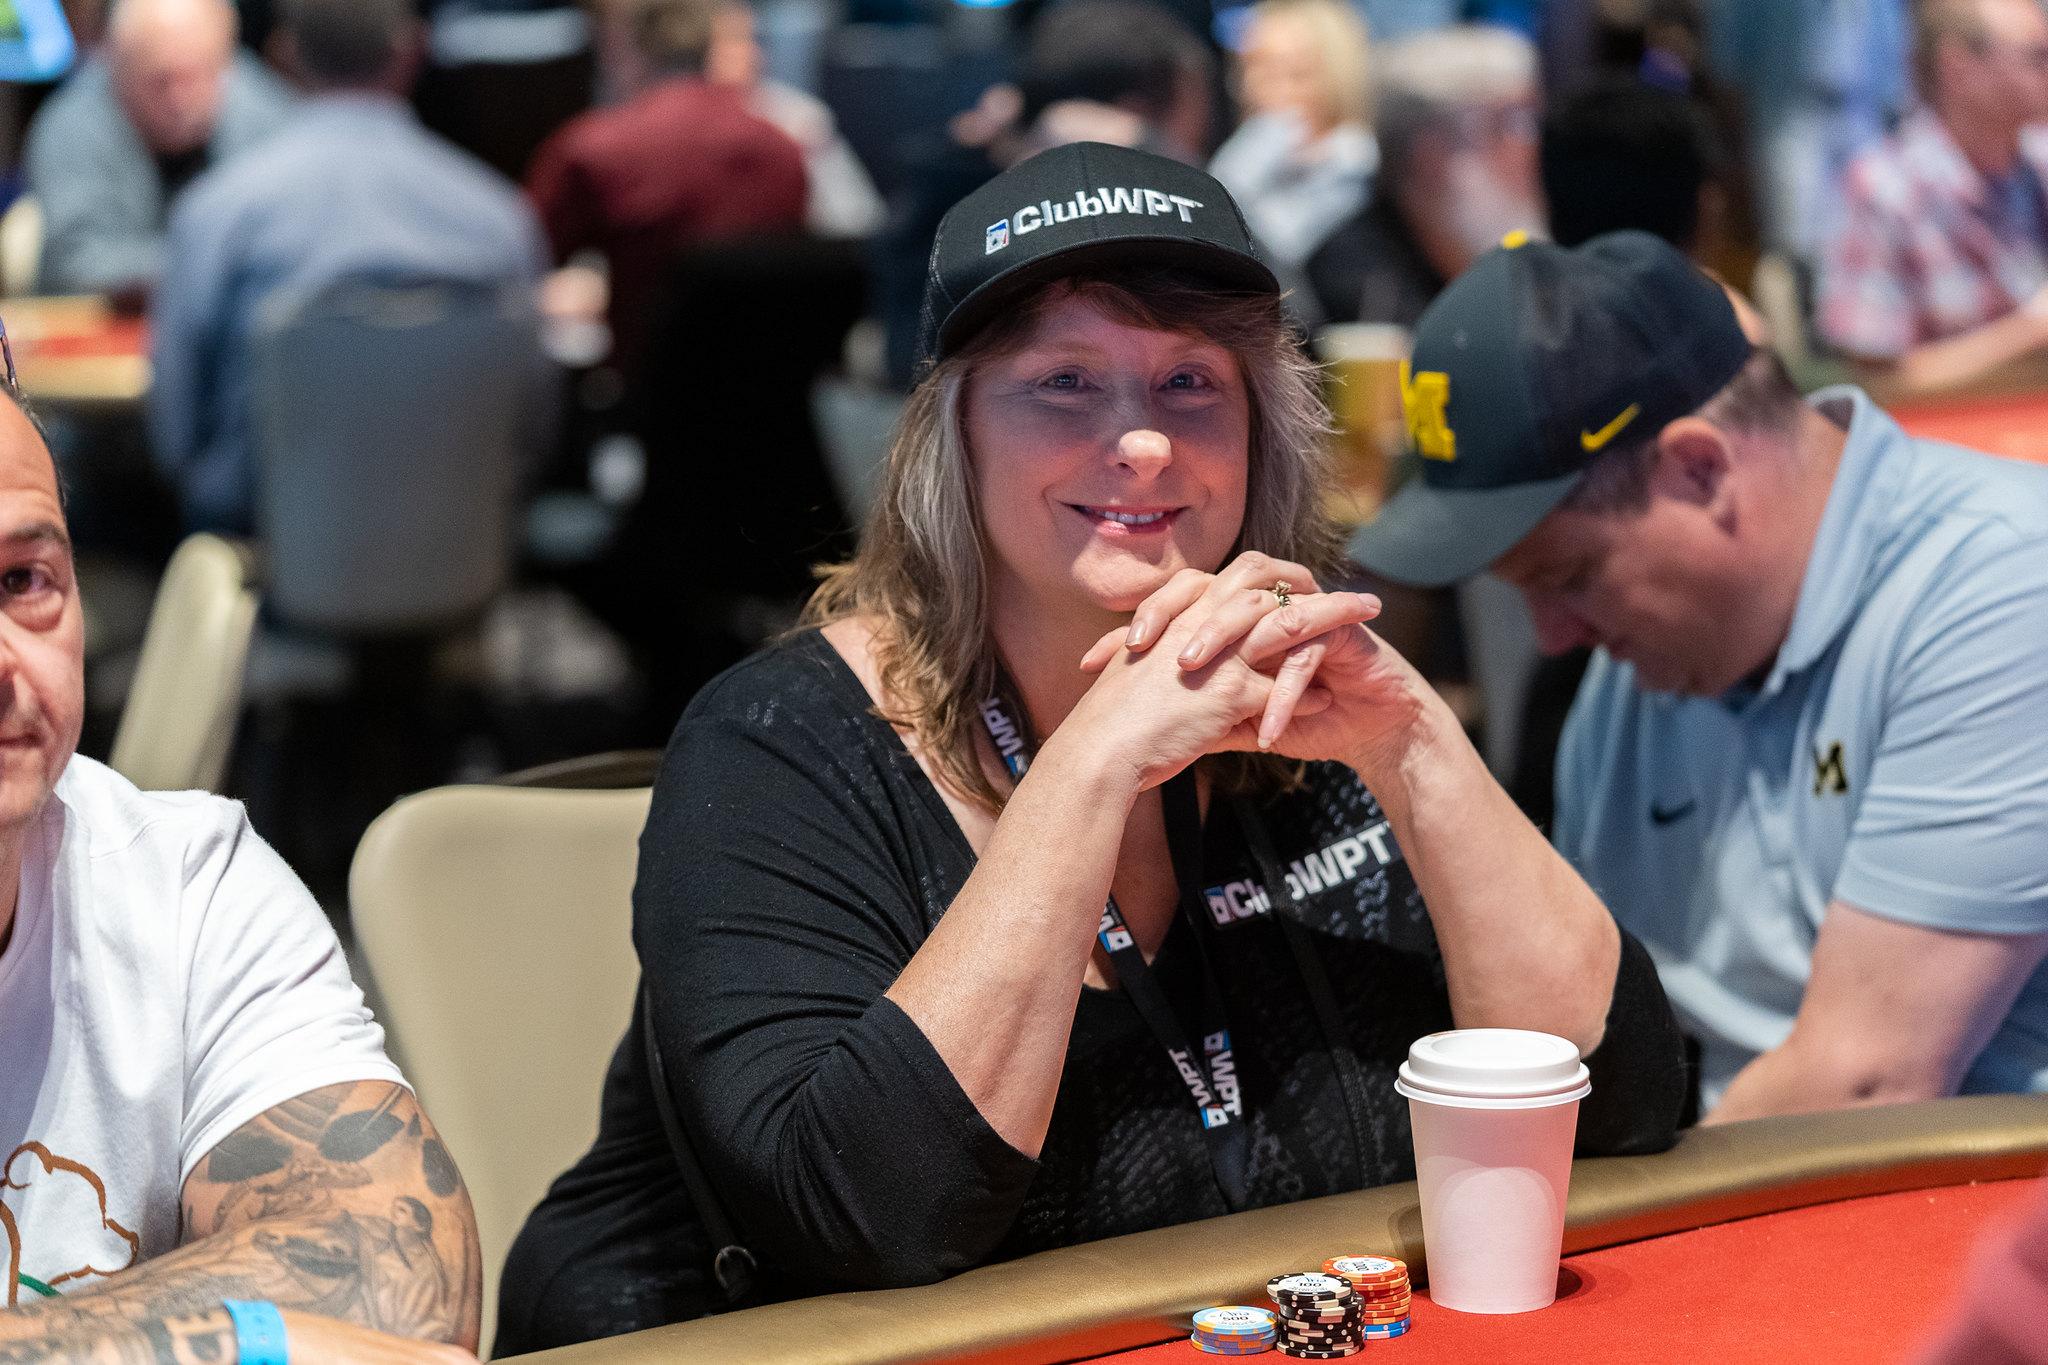 GAYLE KNORR ClubWPT Zynga Poker WPT500